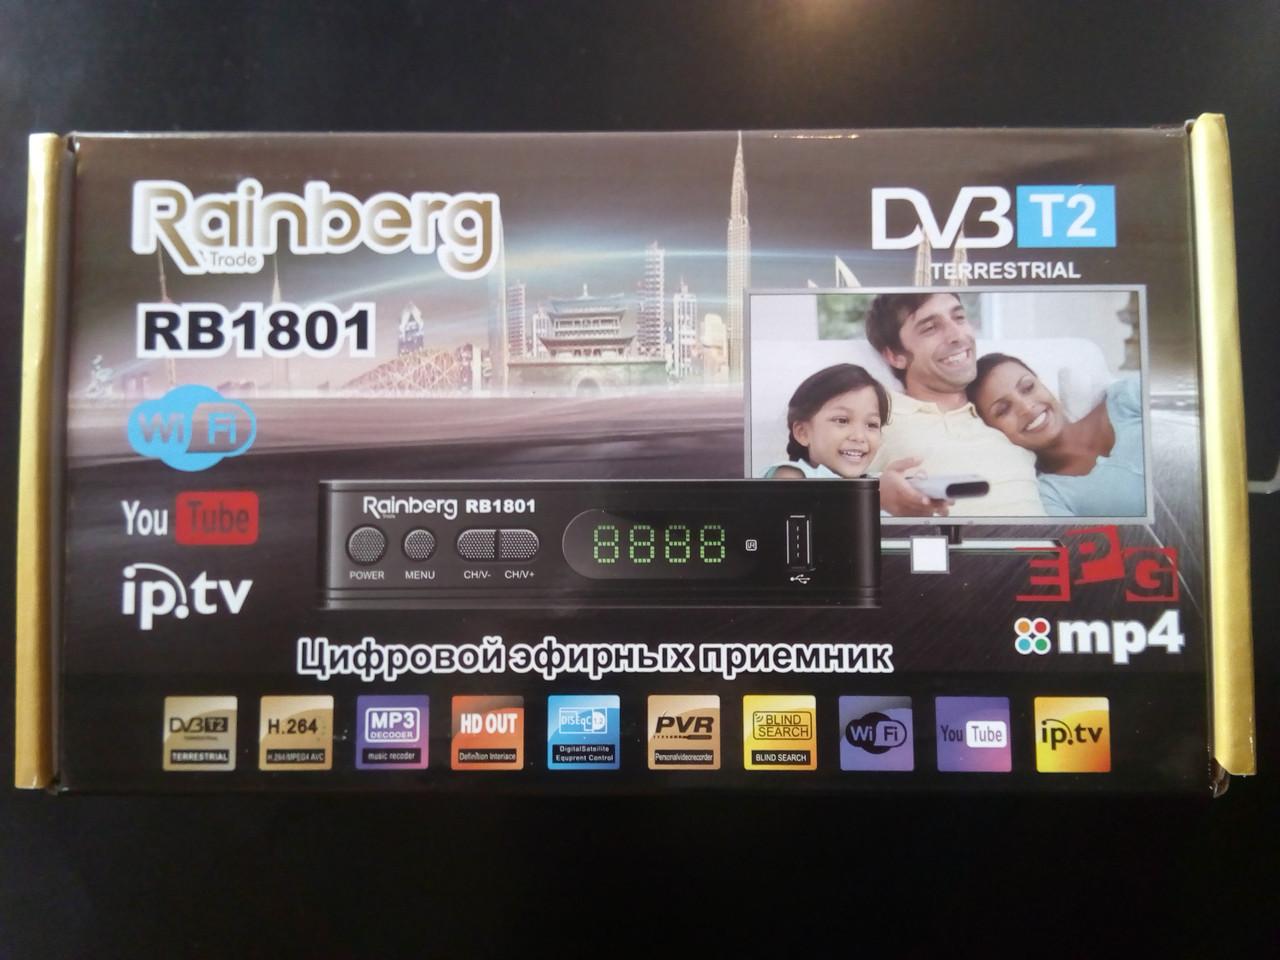 DVB-T2 телевизионный цифровой тюнер Rainberg 1802 с интернетом WI-Fi, Youtube